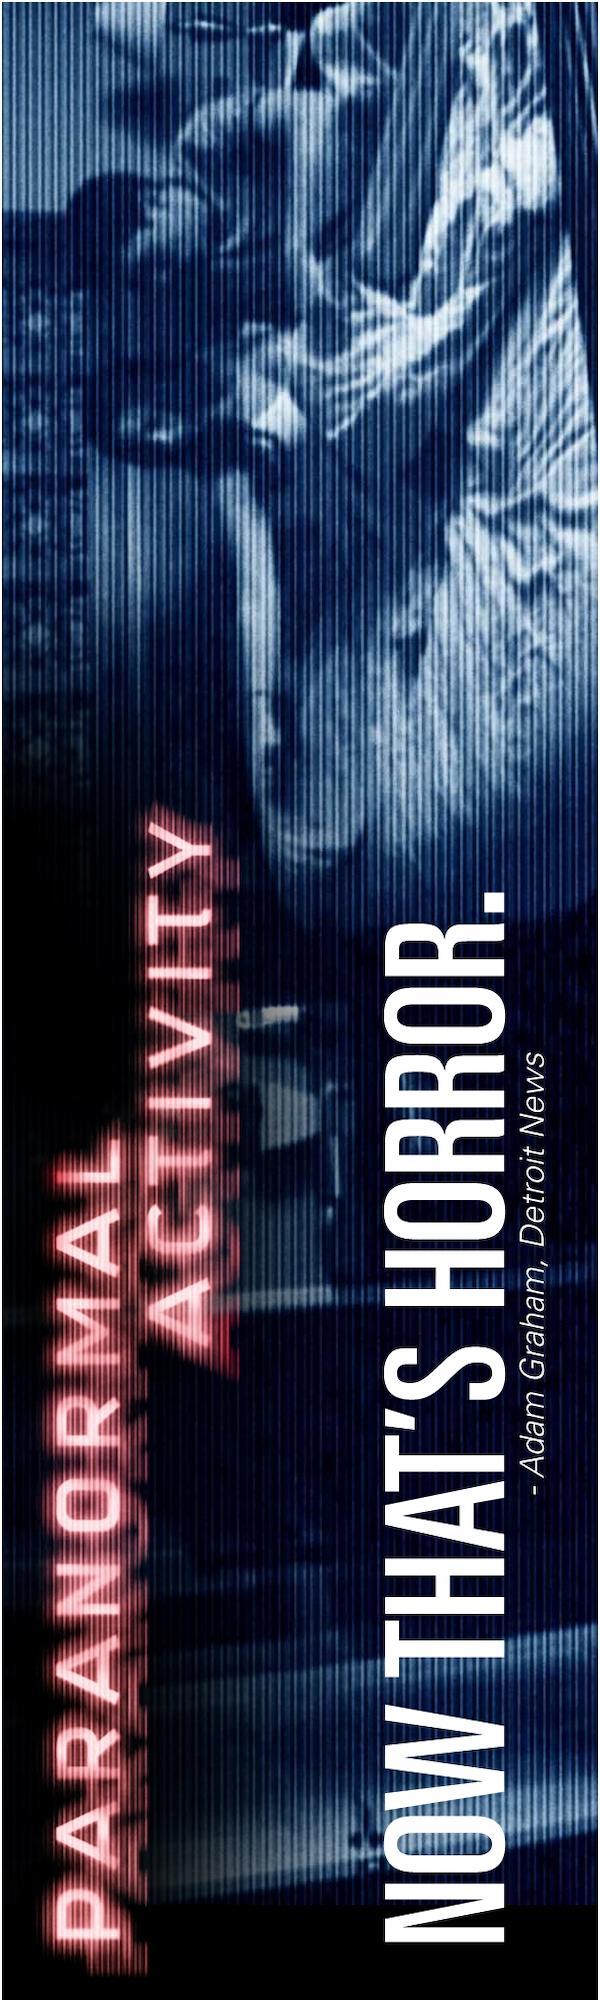 Paranormal Activity 606x2020